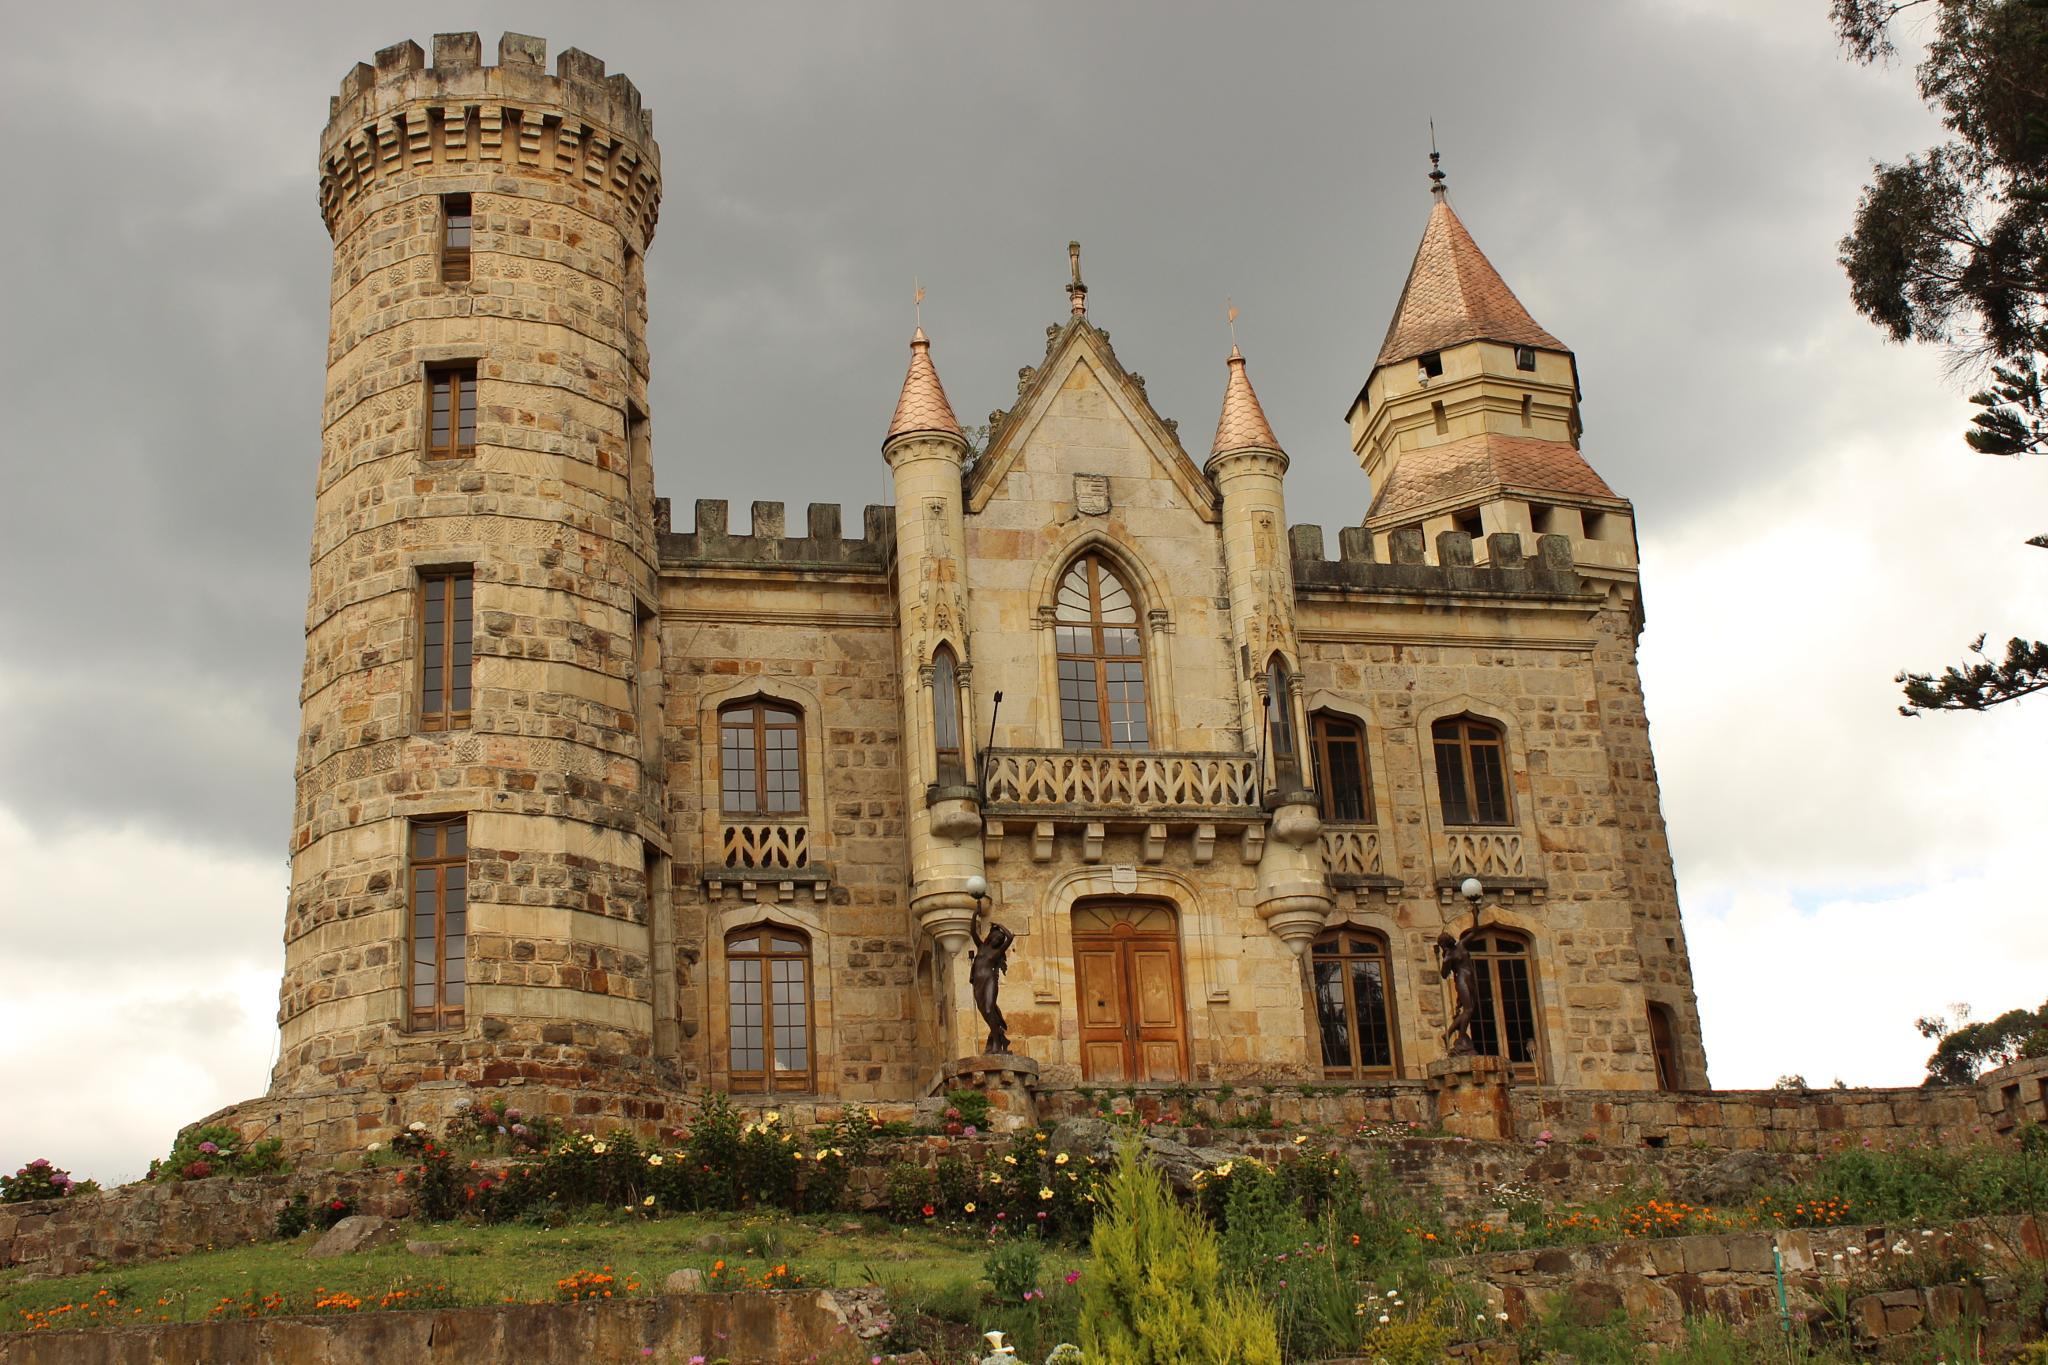 Castillo Marroquin, Chia, Colombia. by Fabio Francisco Beltran Barrera